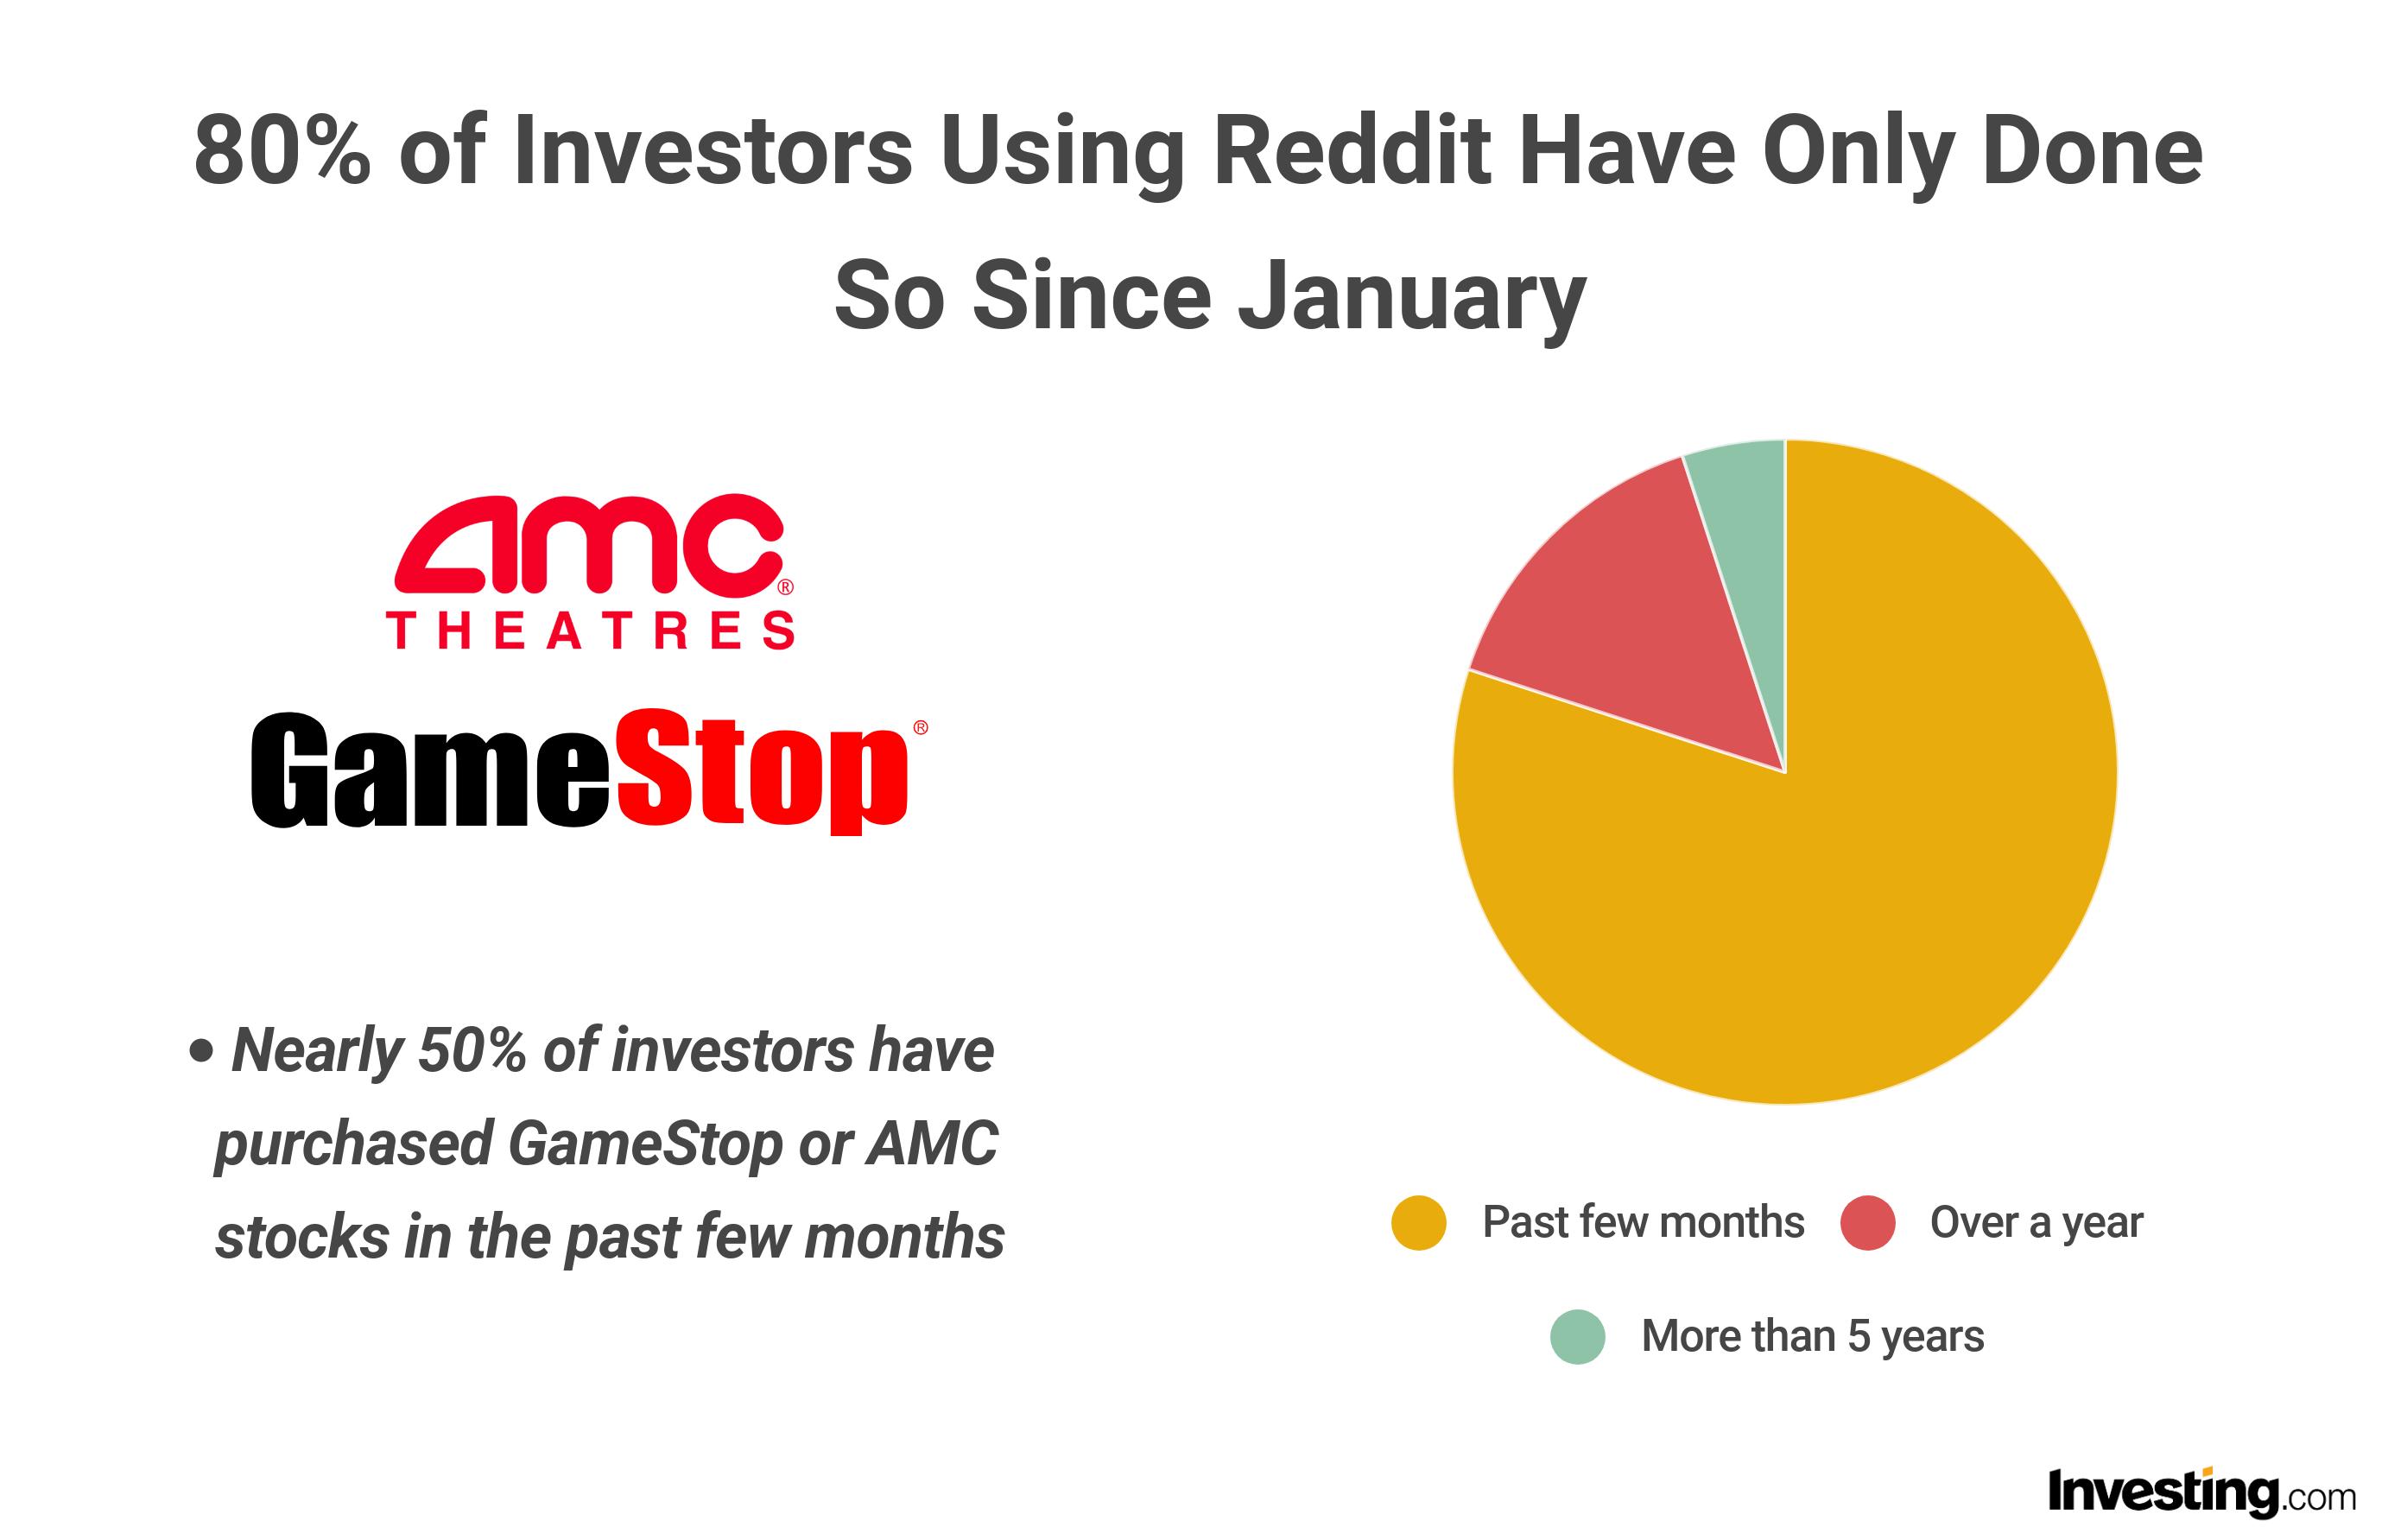 Reddit investing